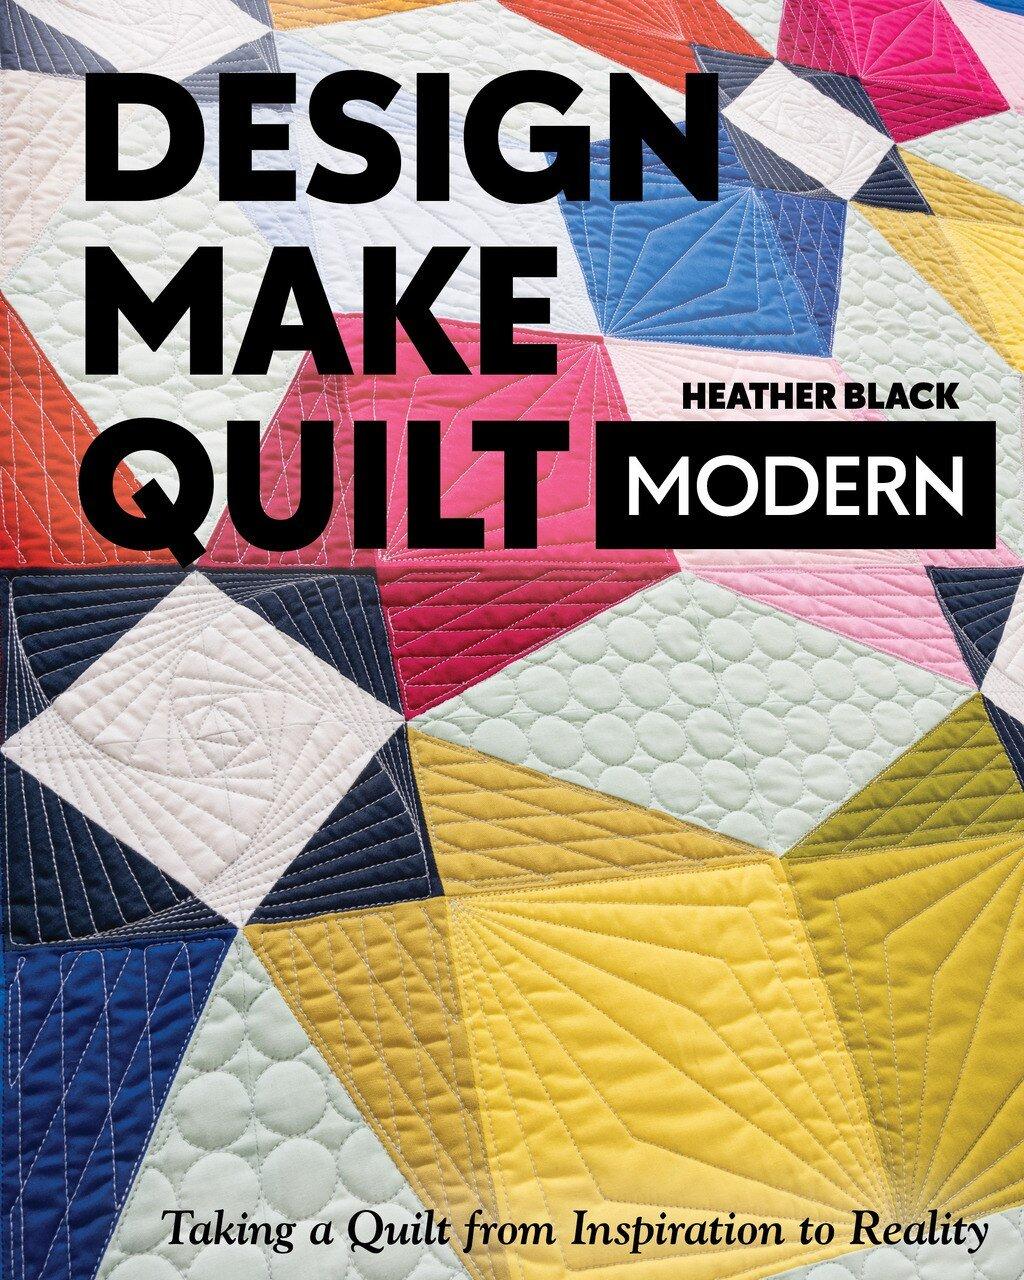 Design, Make, Quilt Modern